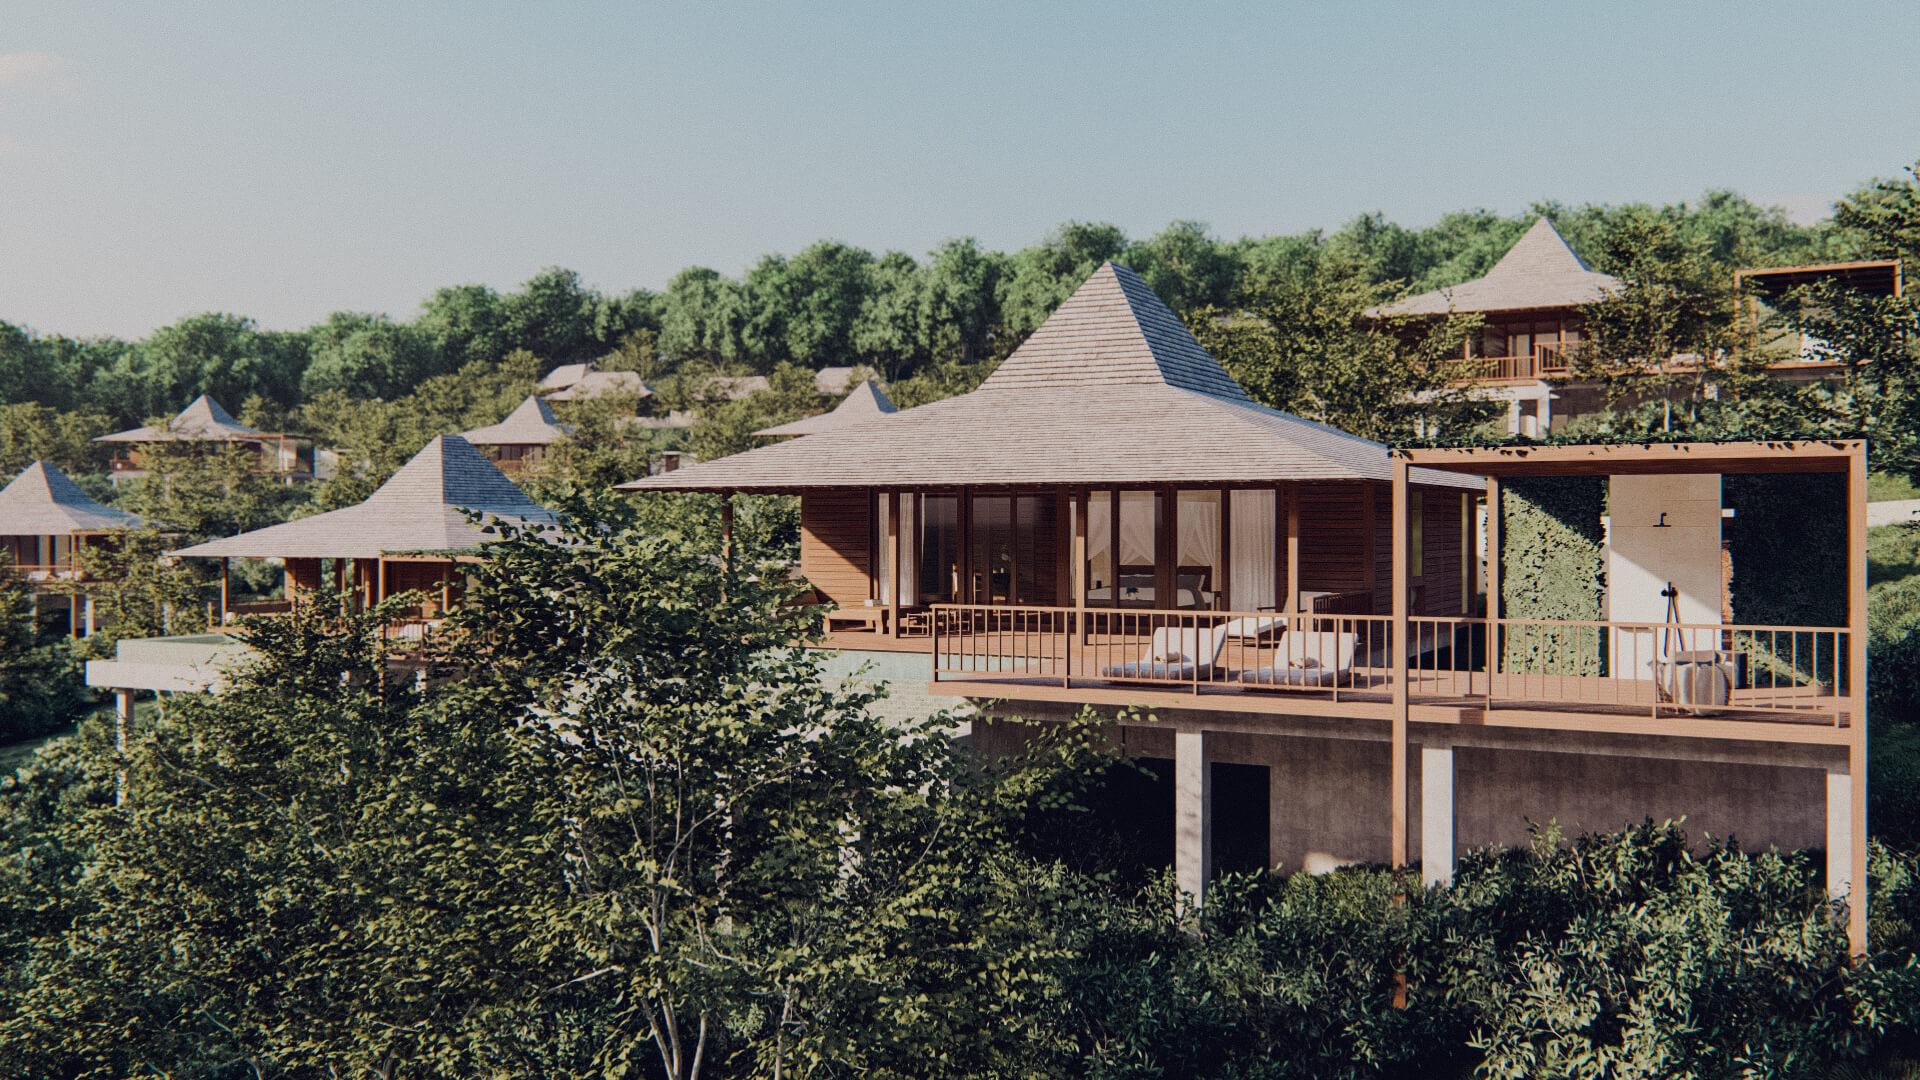 Eco Resort in Lombok Pool Villa Frontal Elevation